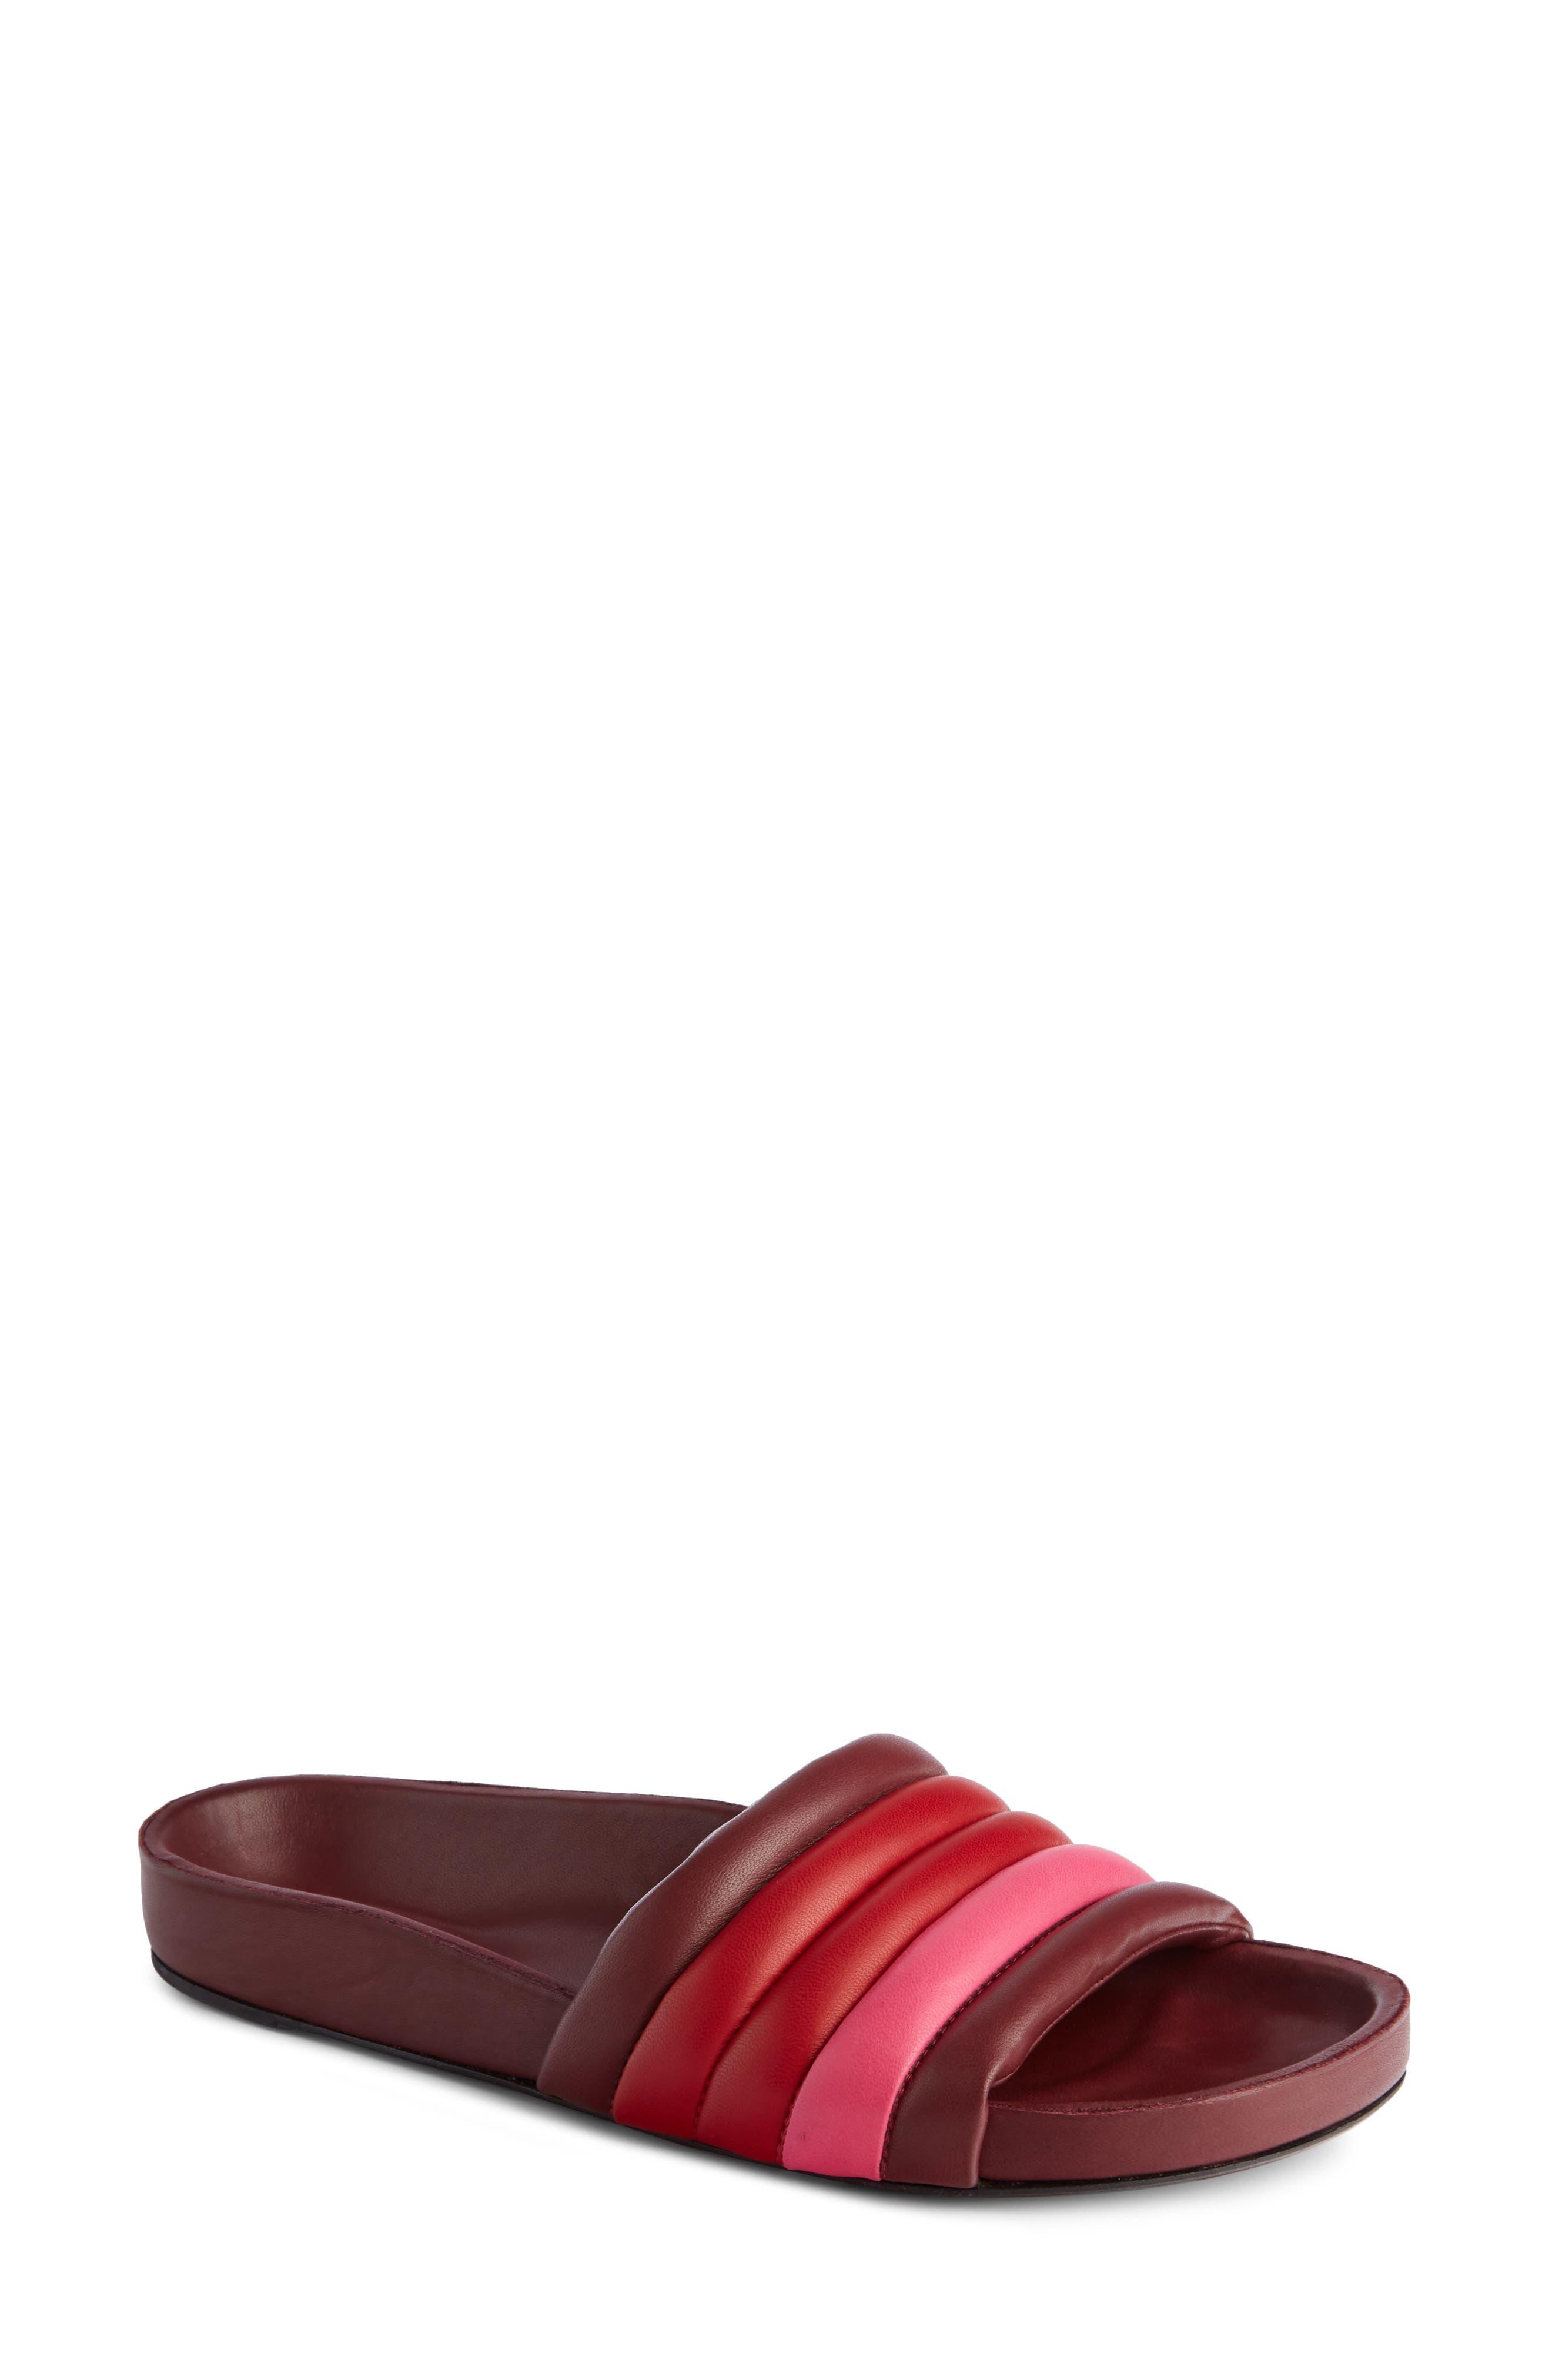 Hellea Slide Sandal,                             Main thumbnail 1, color,                             Burgundy/ Red/ Pink